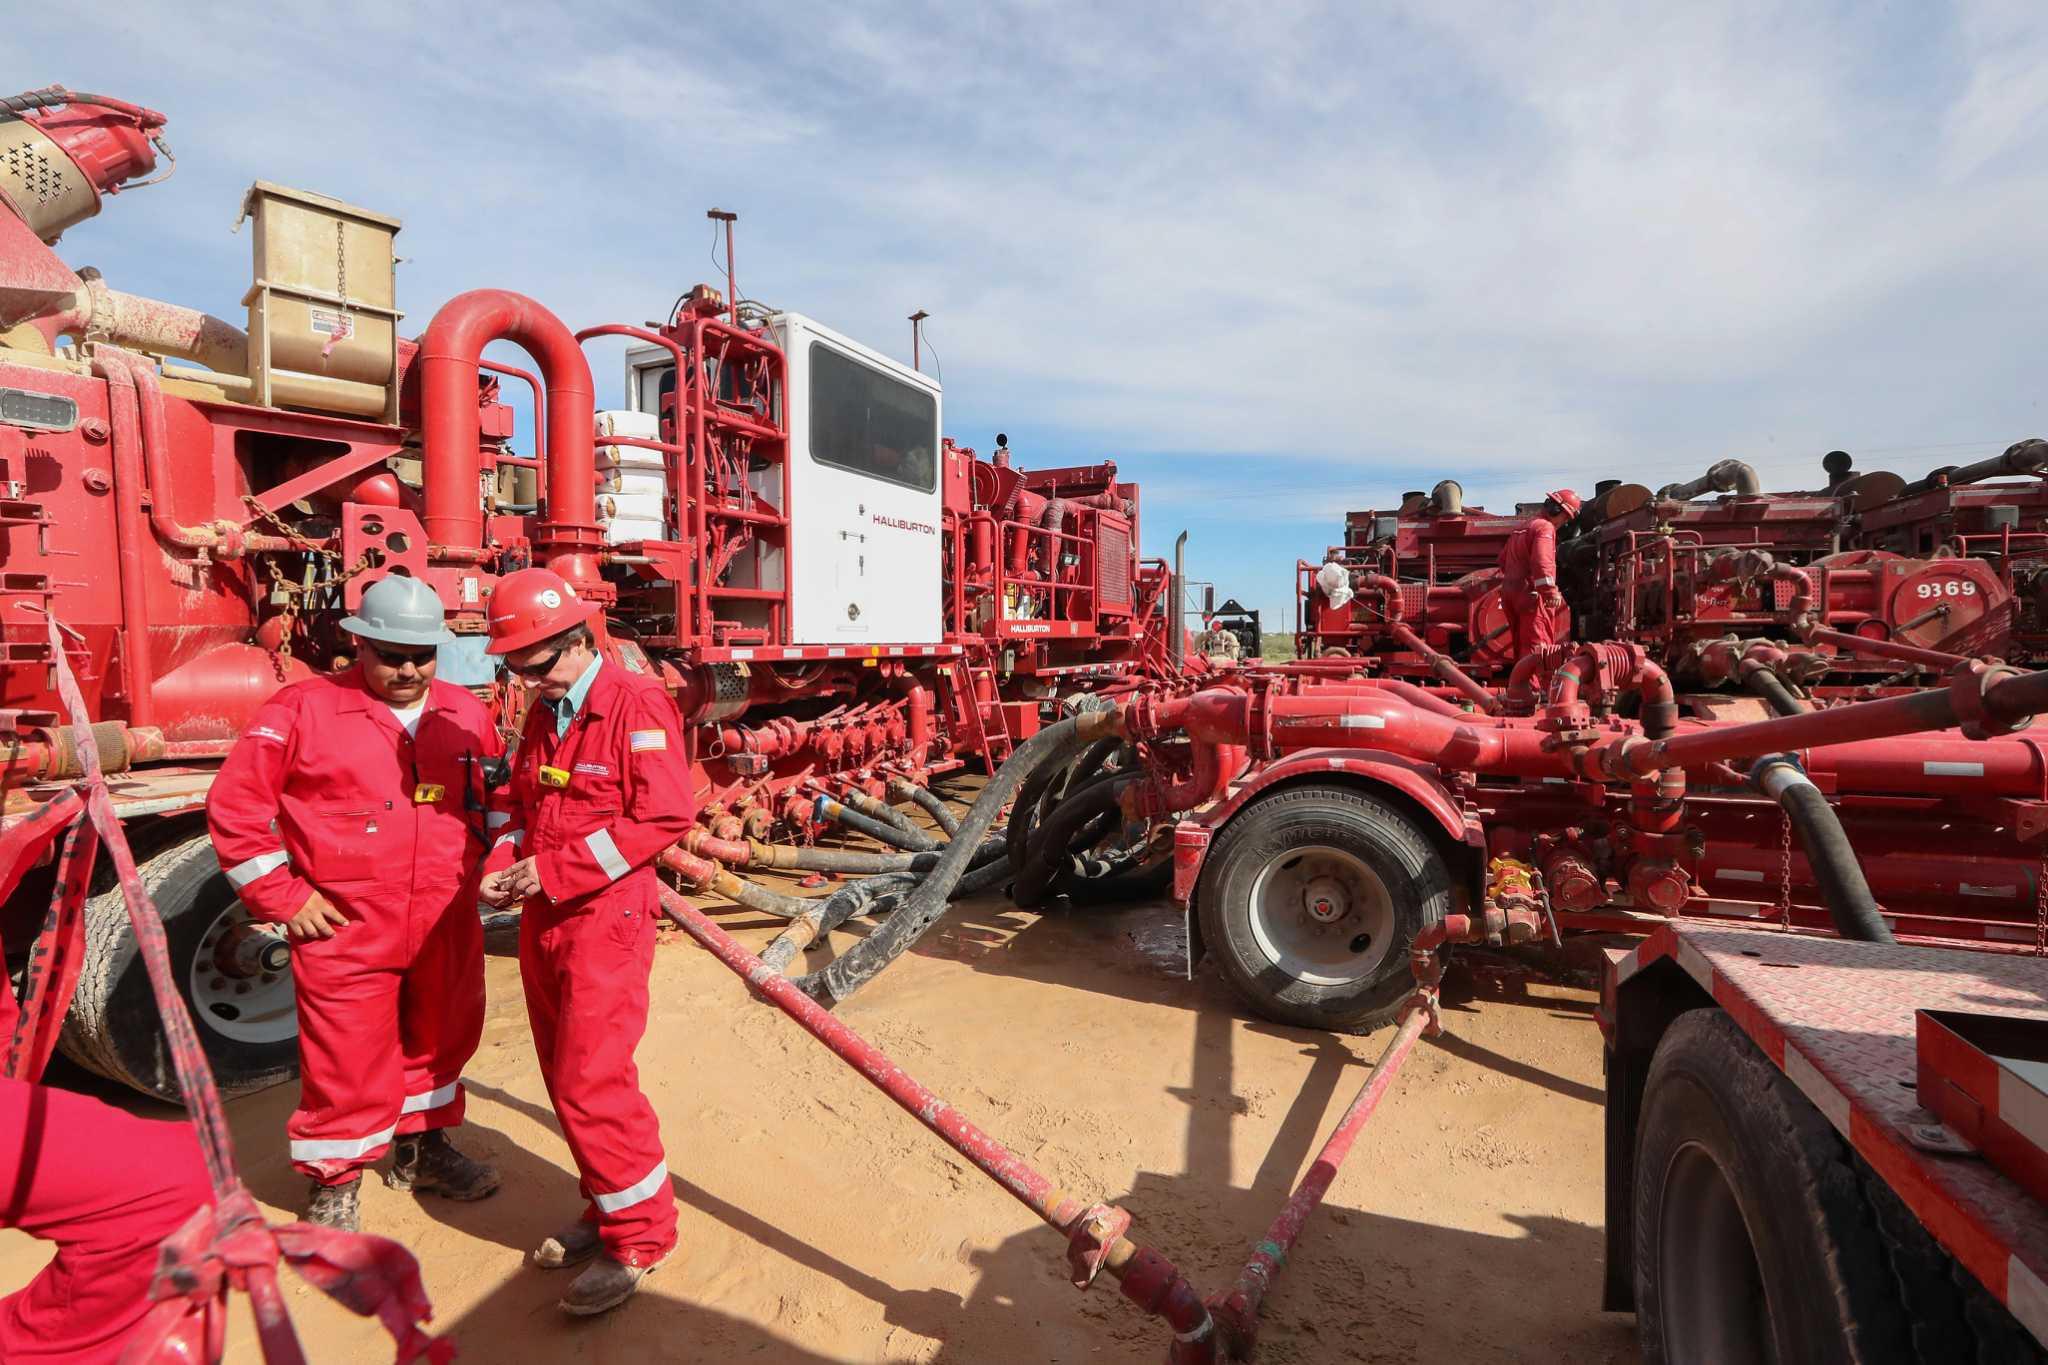 Halliburton closes 2019 with $1.7 billion loss